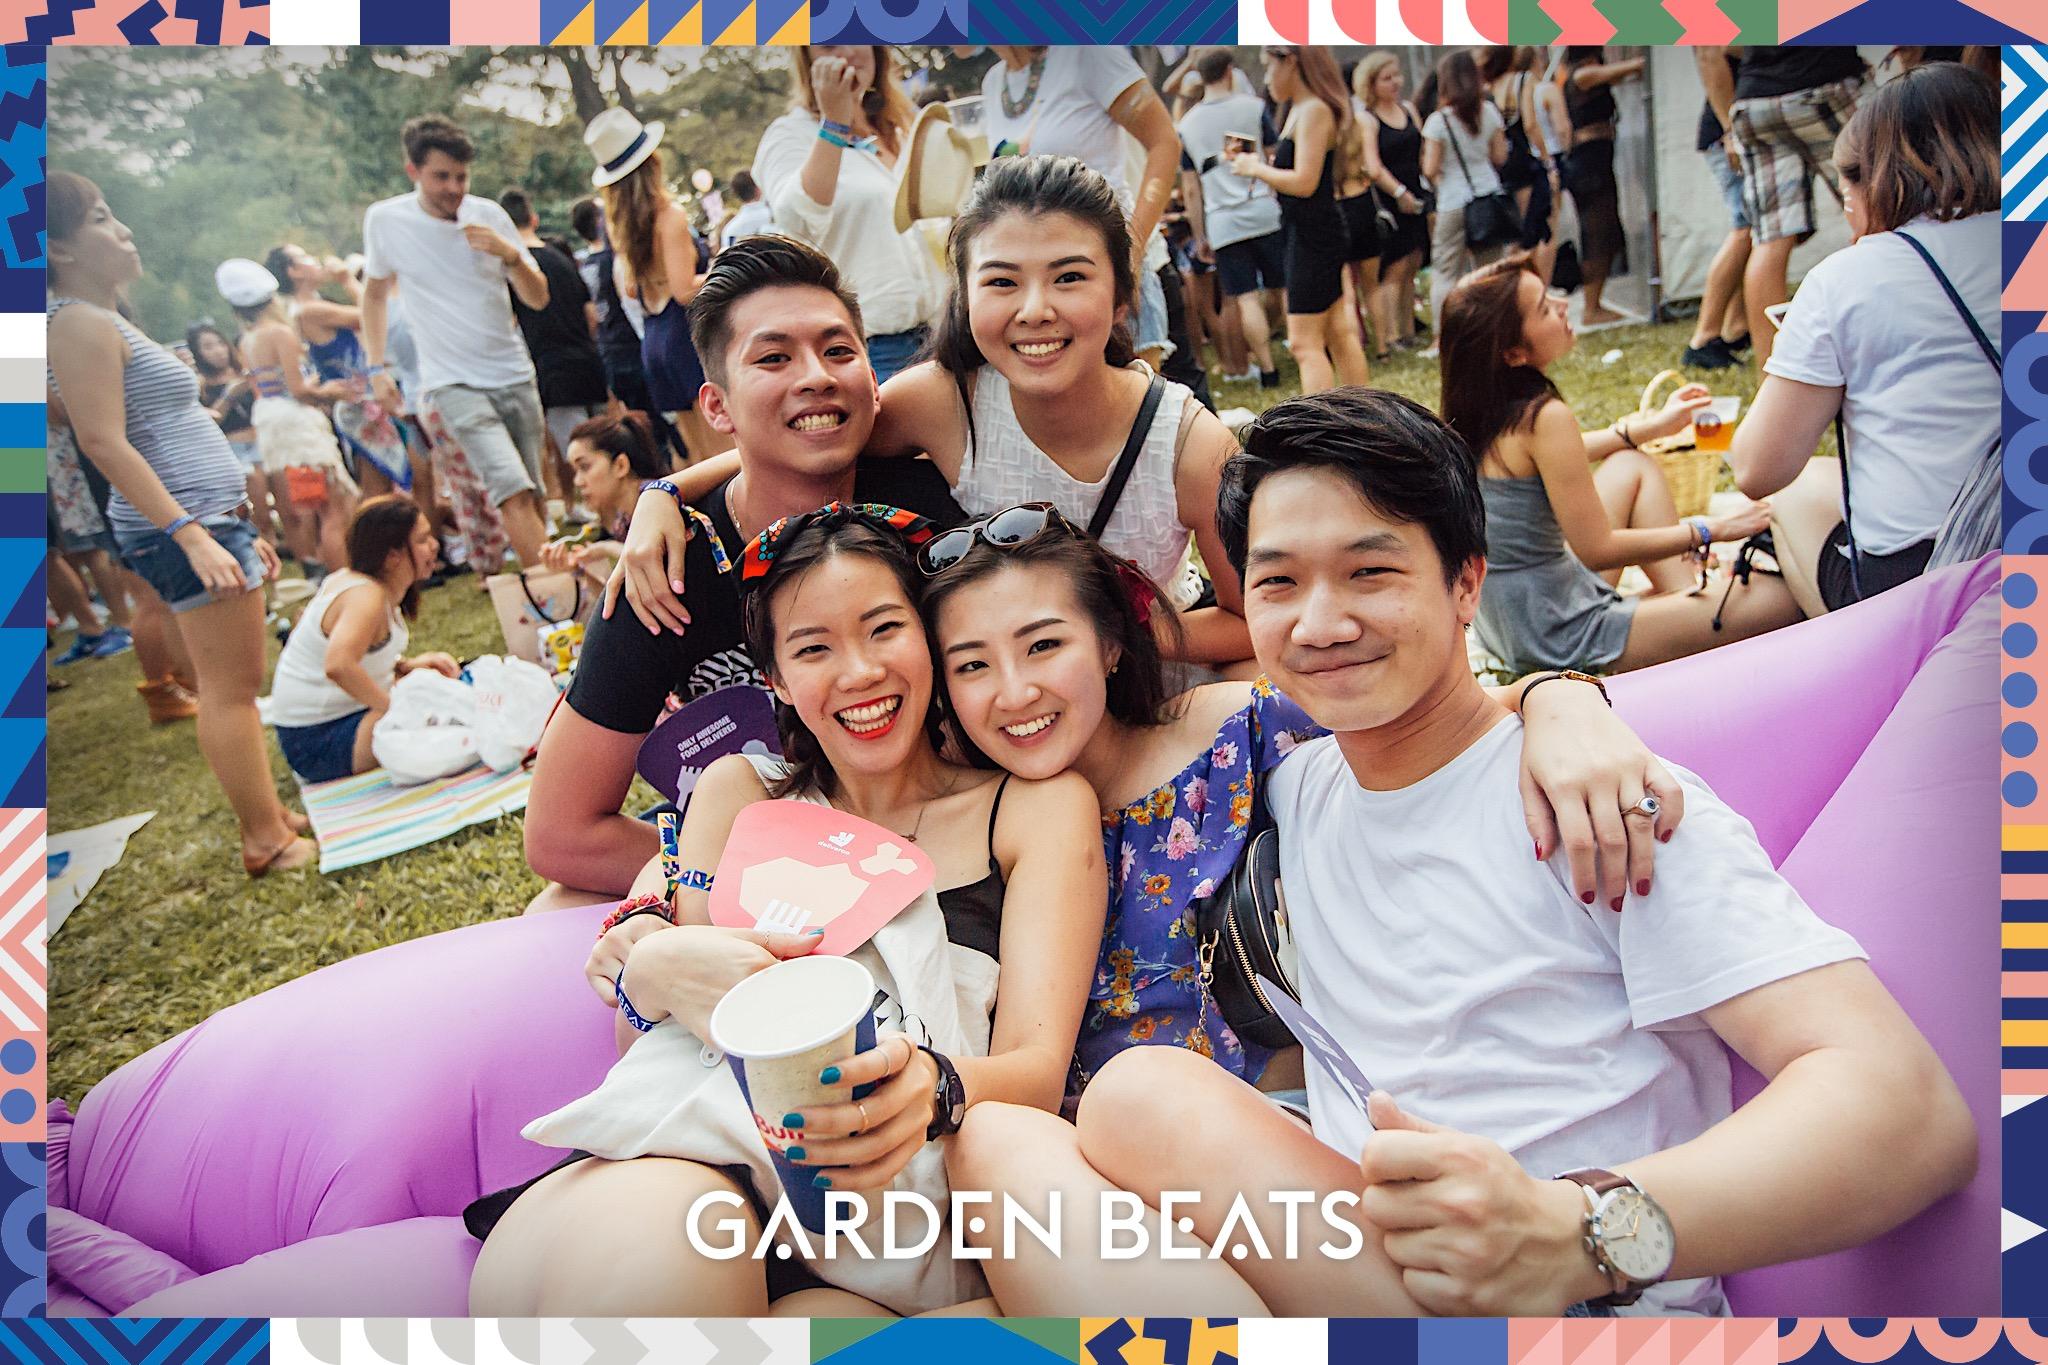 18032017_GardenBeats_Colossal687_WatermarkedGB.jpg